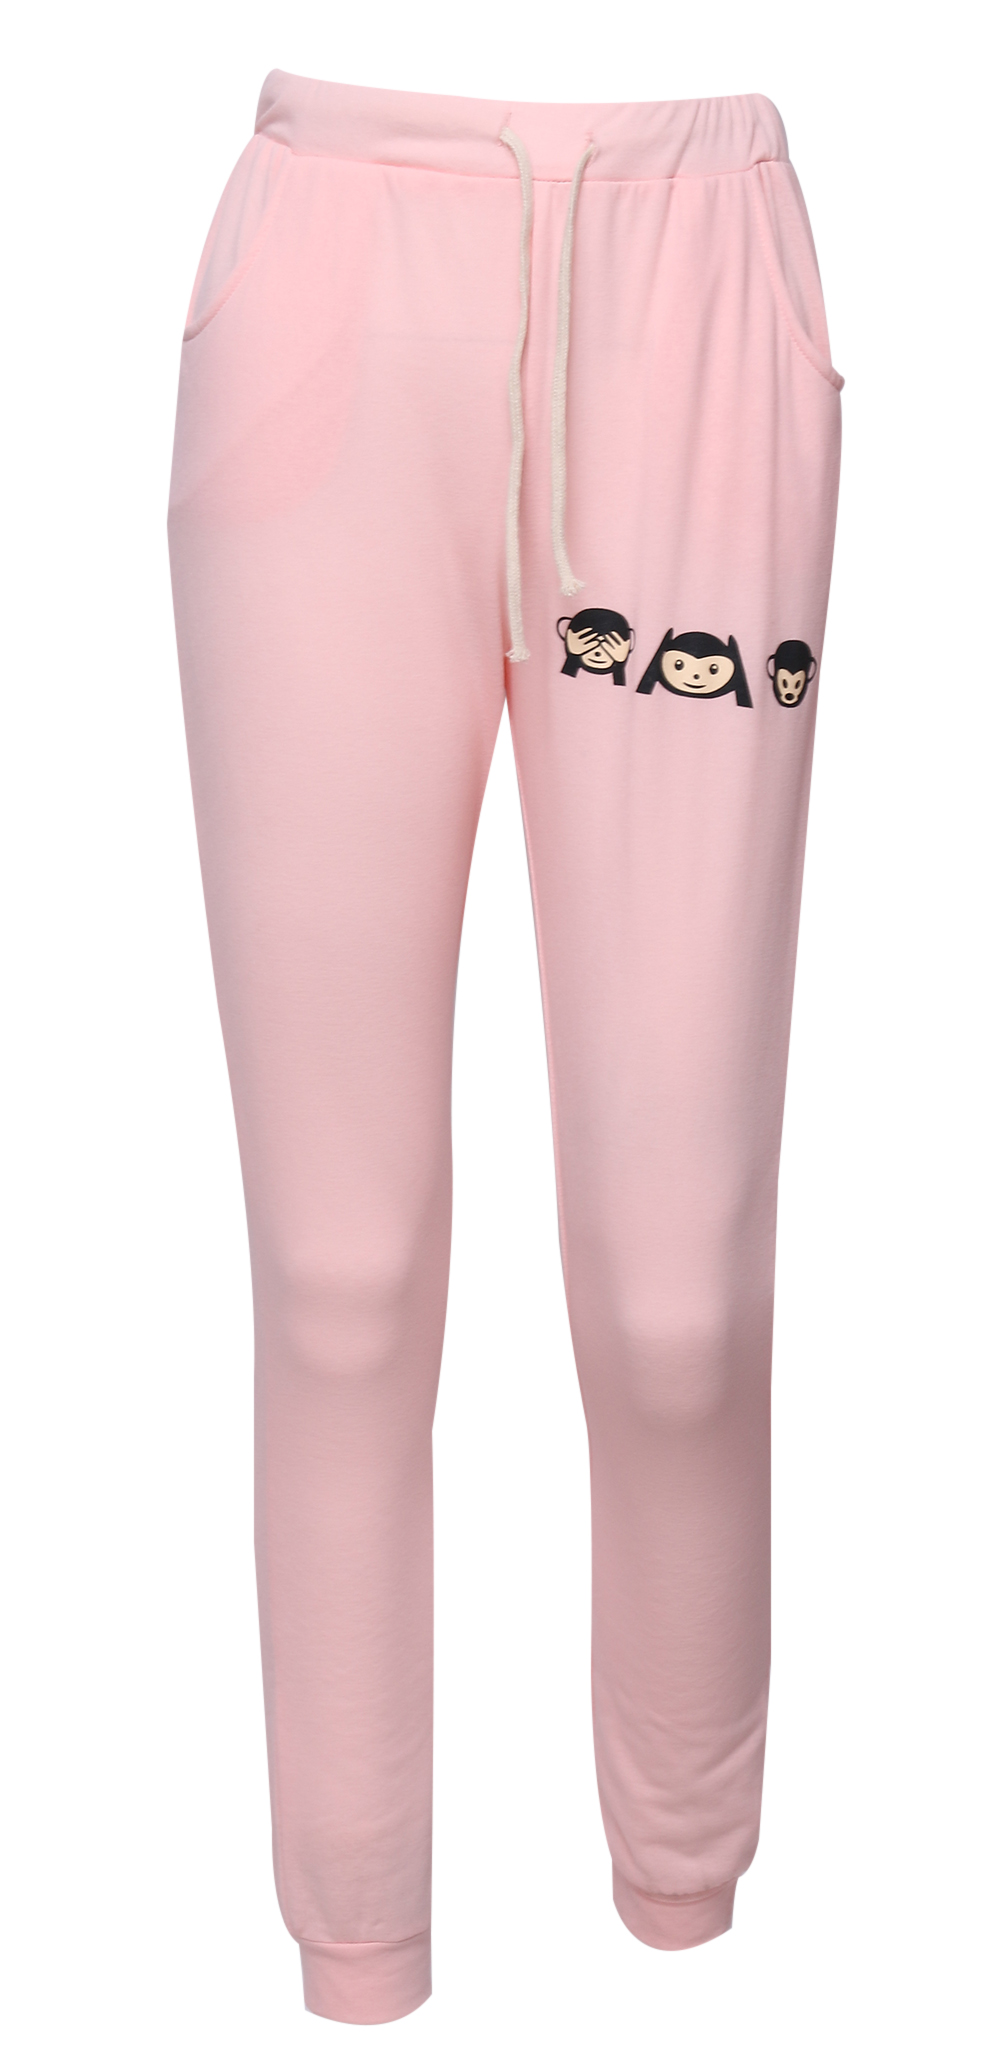 Damen hose pink